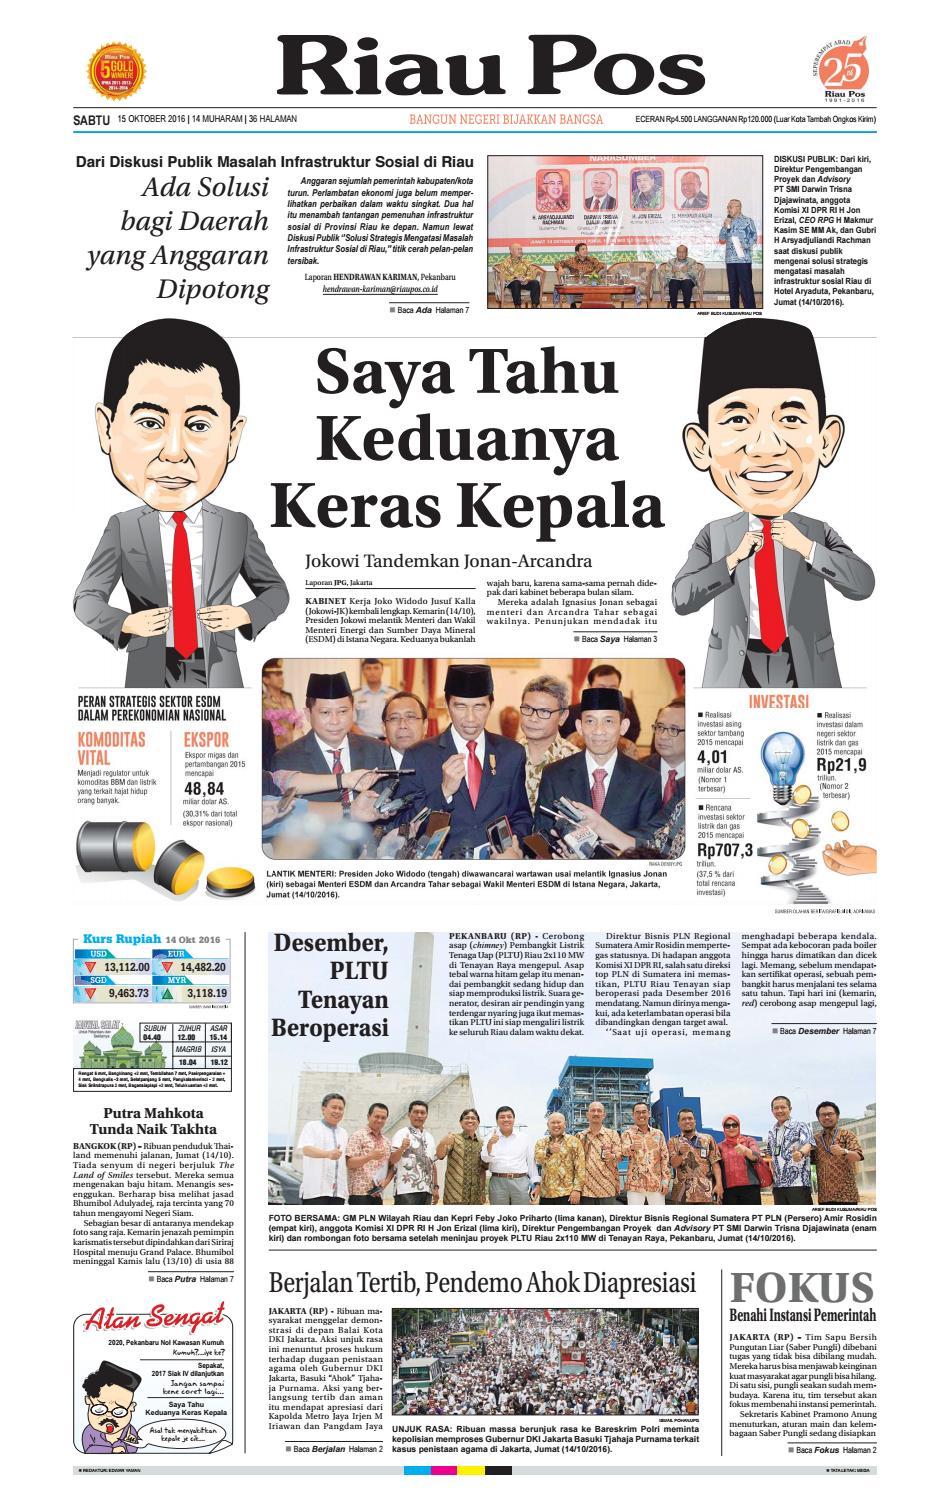 2016 10 15 By Riau Pos Issuu Produk Ukm Bumn Bella Dan Balon Merah